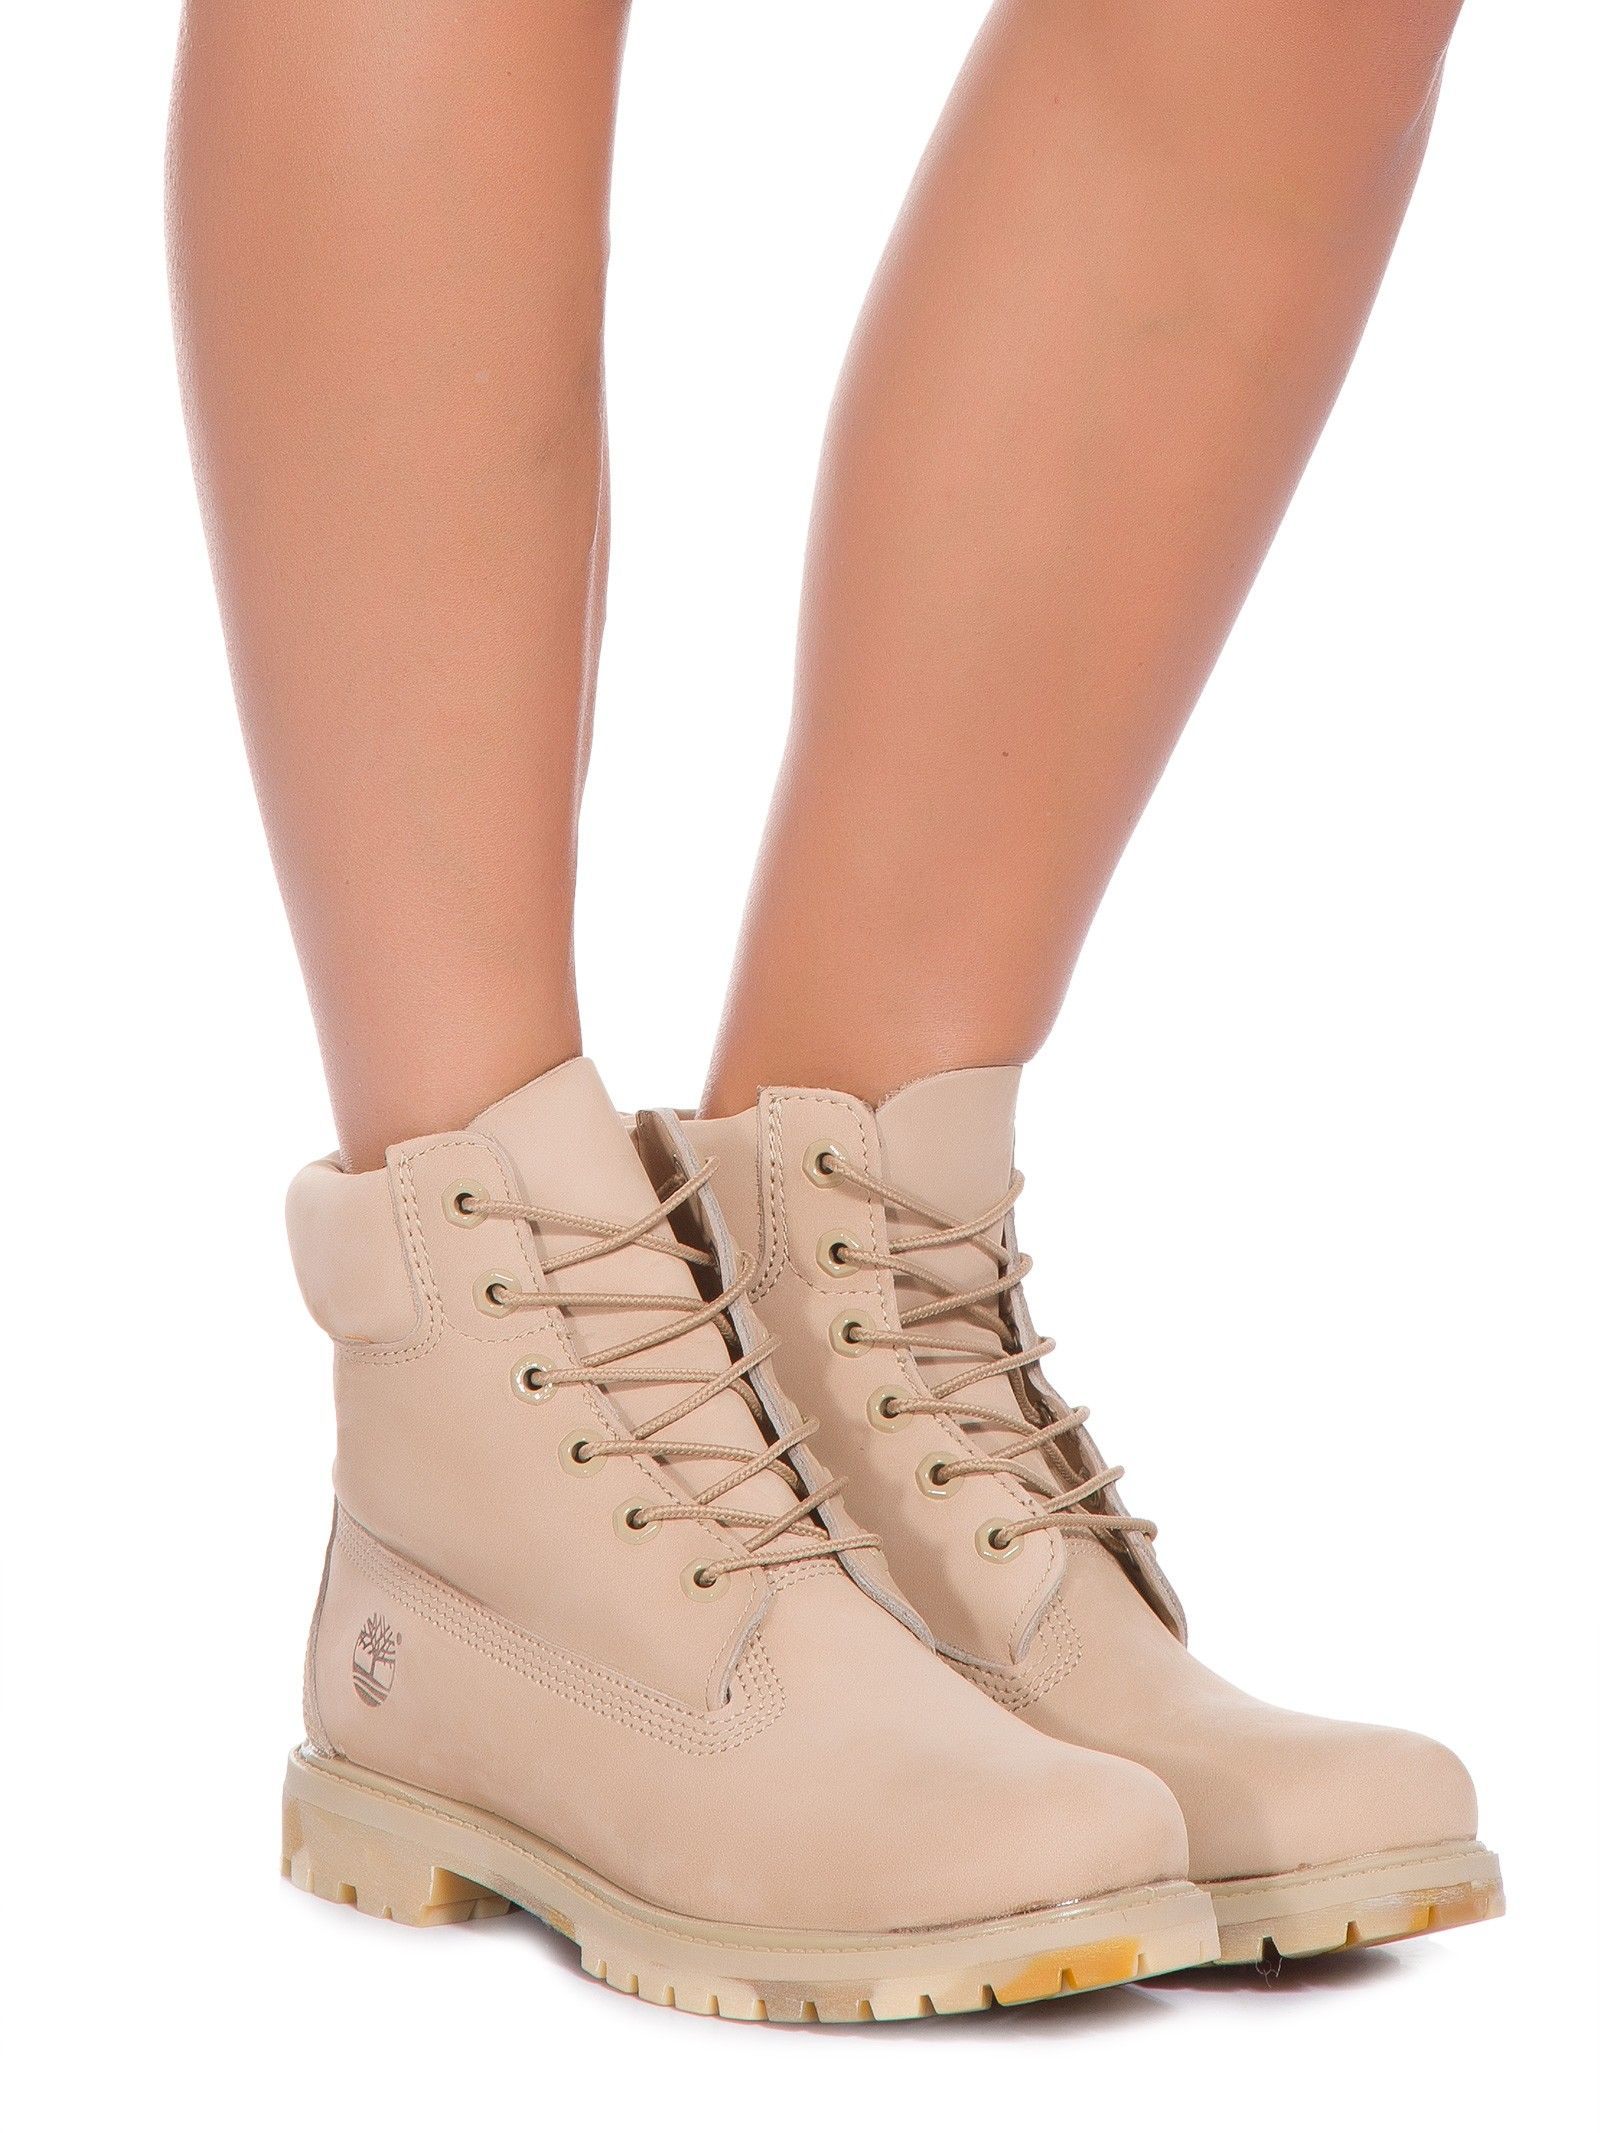 0250574e5d Bota Feminina Yellow Boot 6 Premium - Timberland - Bege - Shop2gether